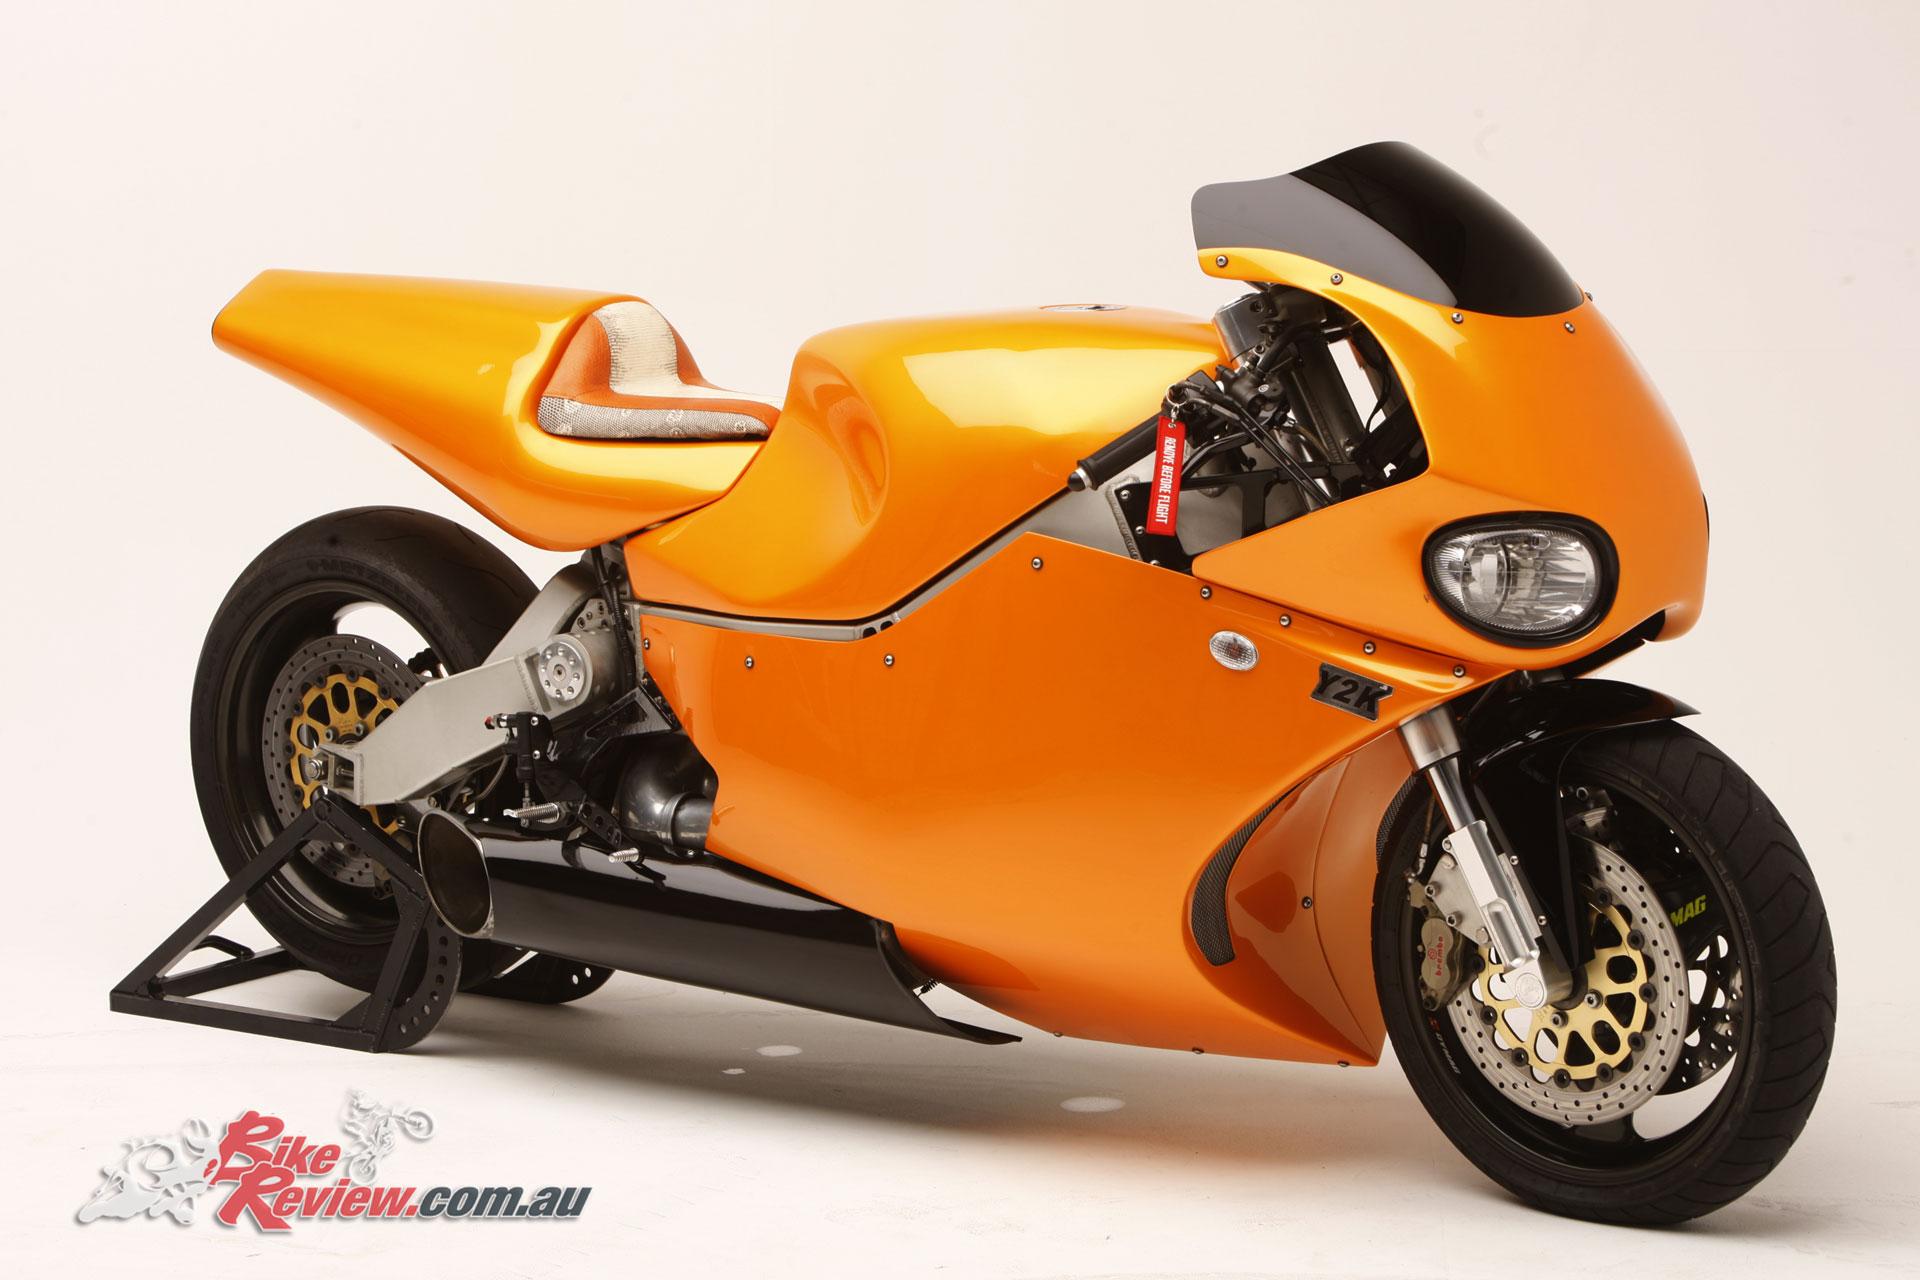 Custom Mtt Y2k Turbine Motorcycle 320hp 400km H Bike